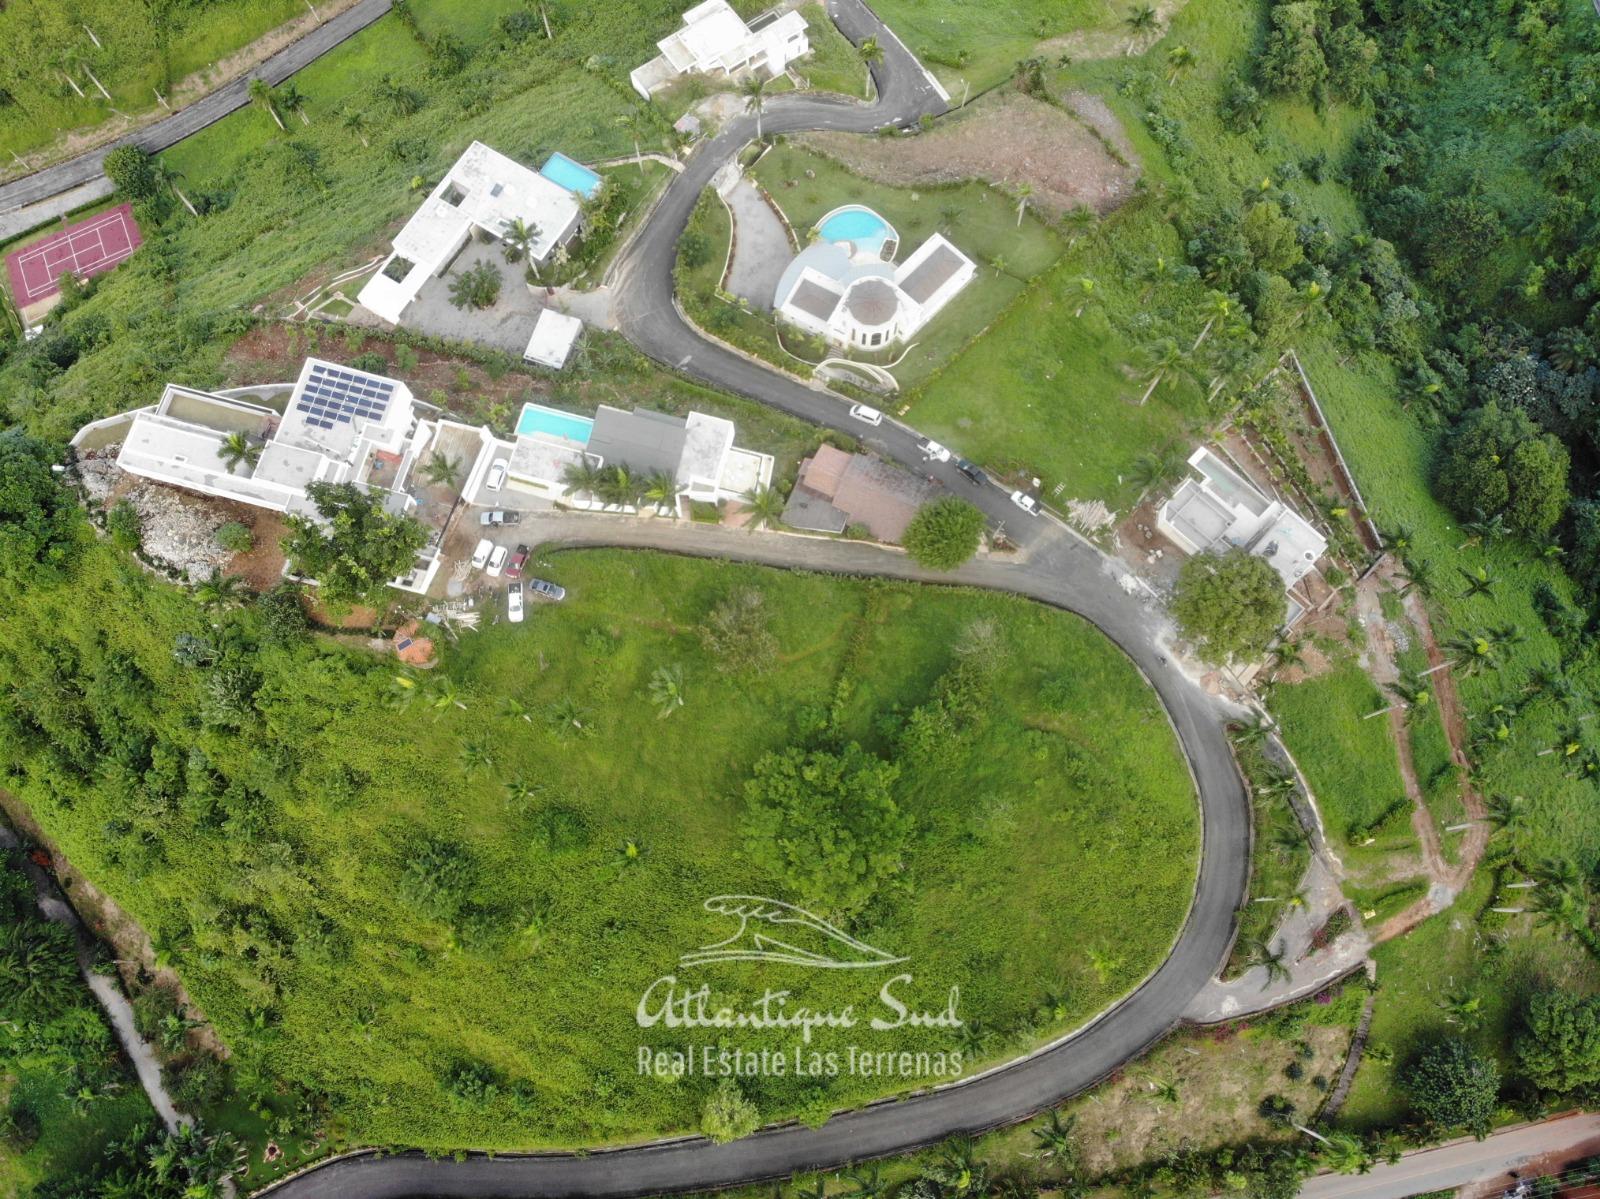 Hillside Lots for sale in Las Terrenas33.jpeg